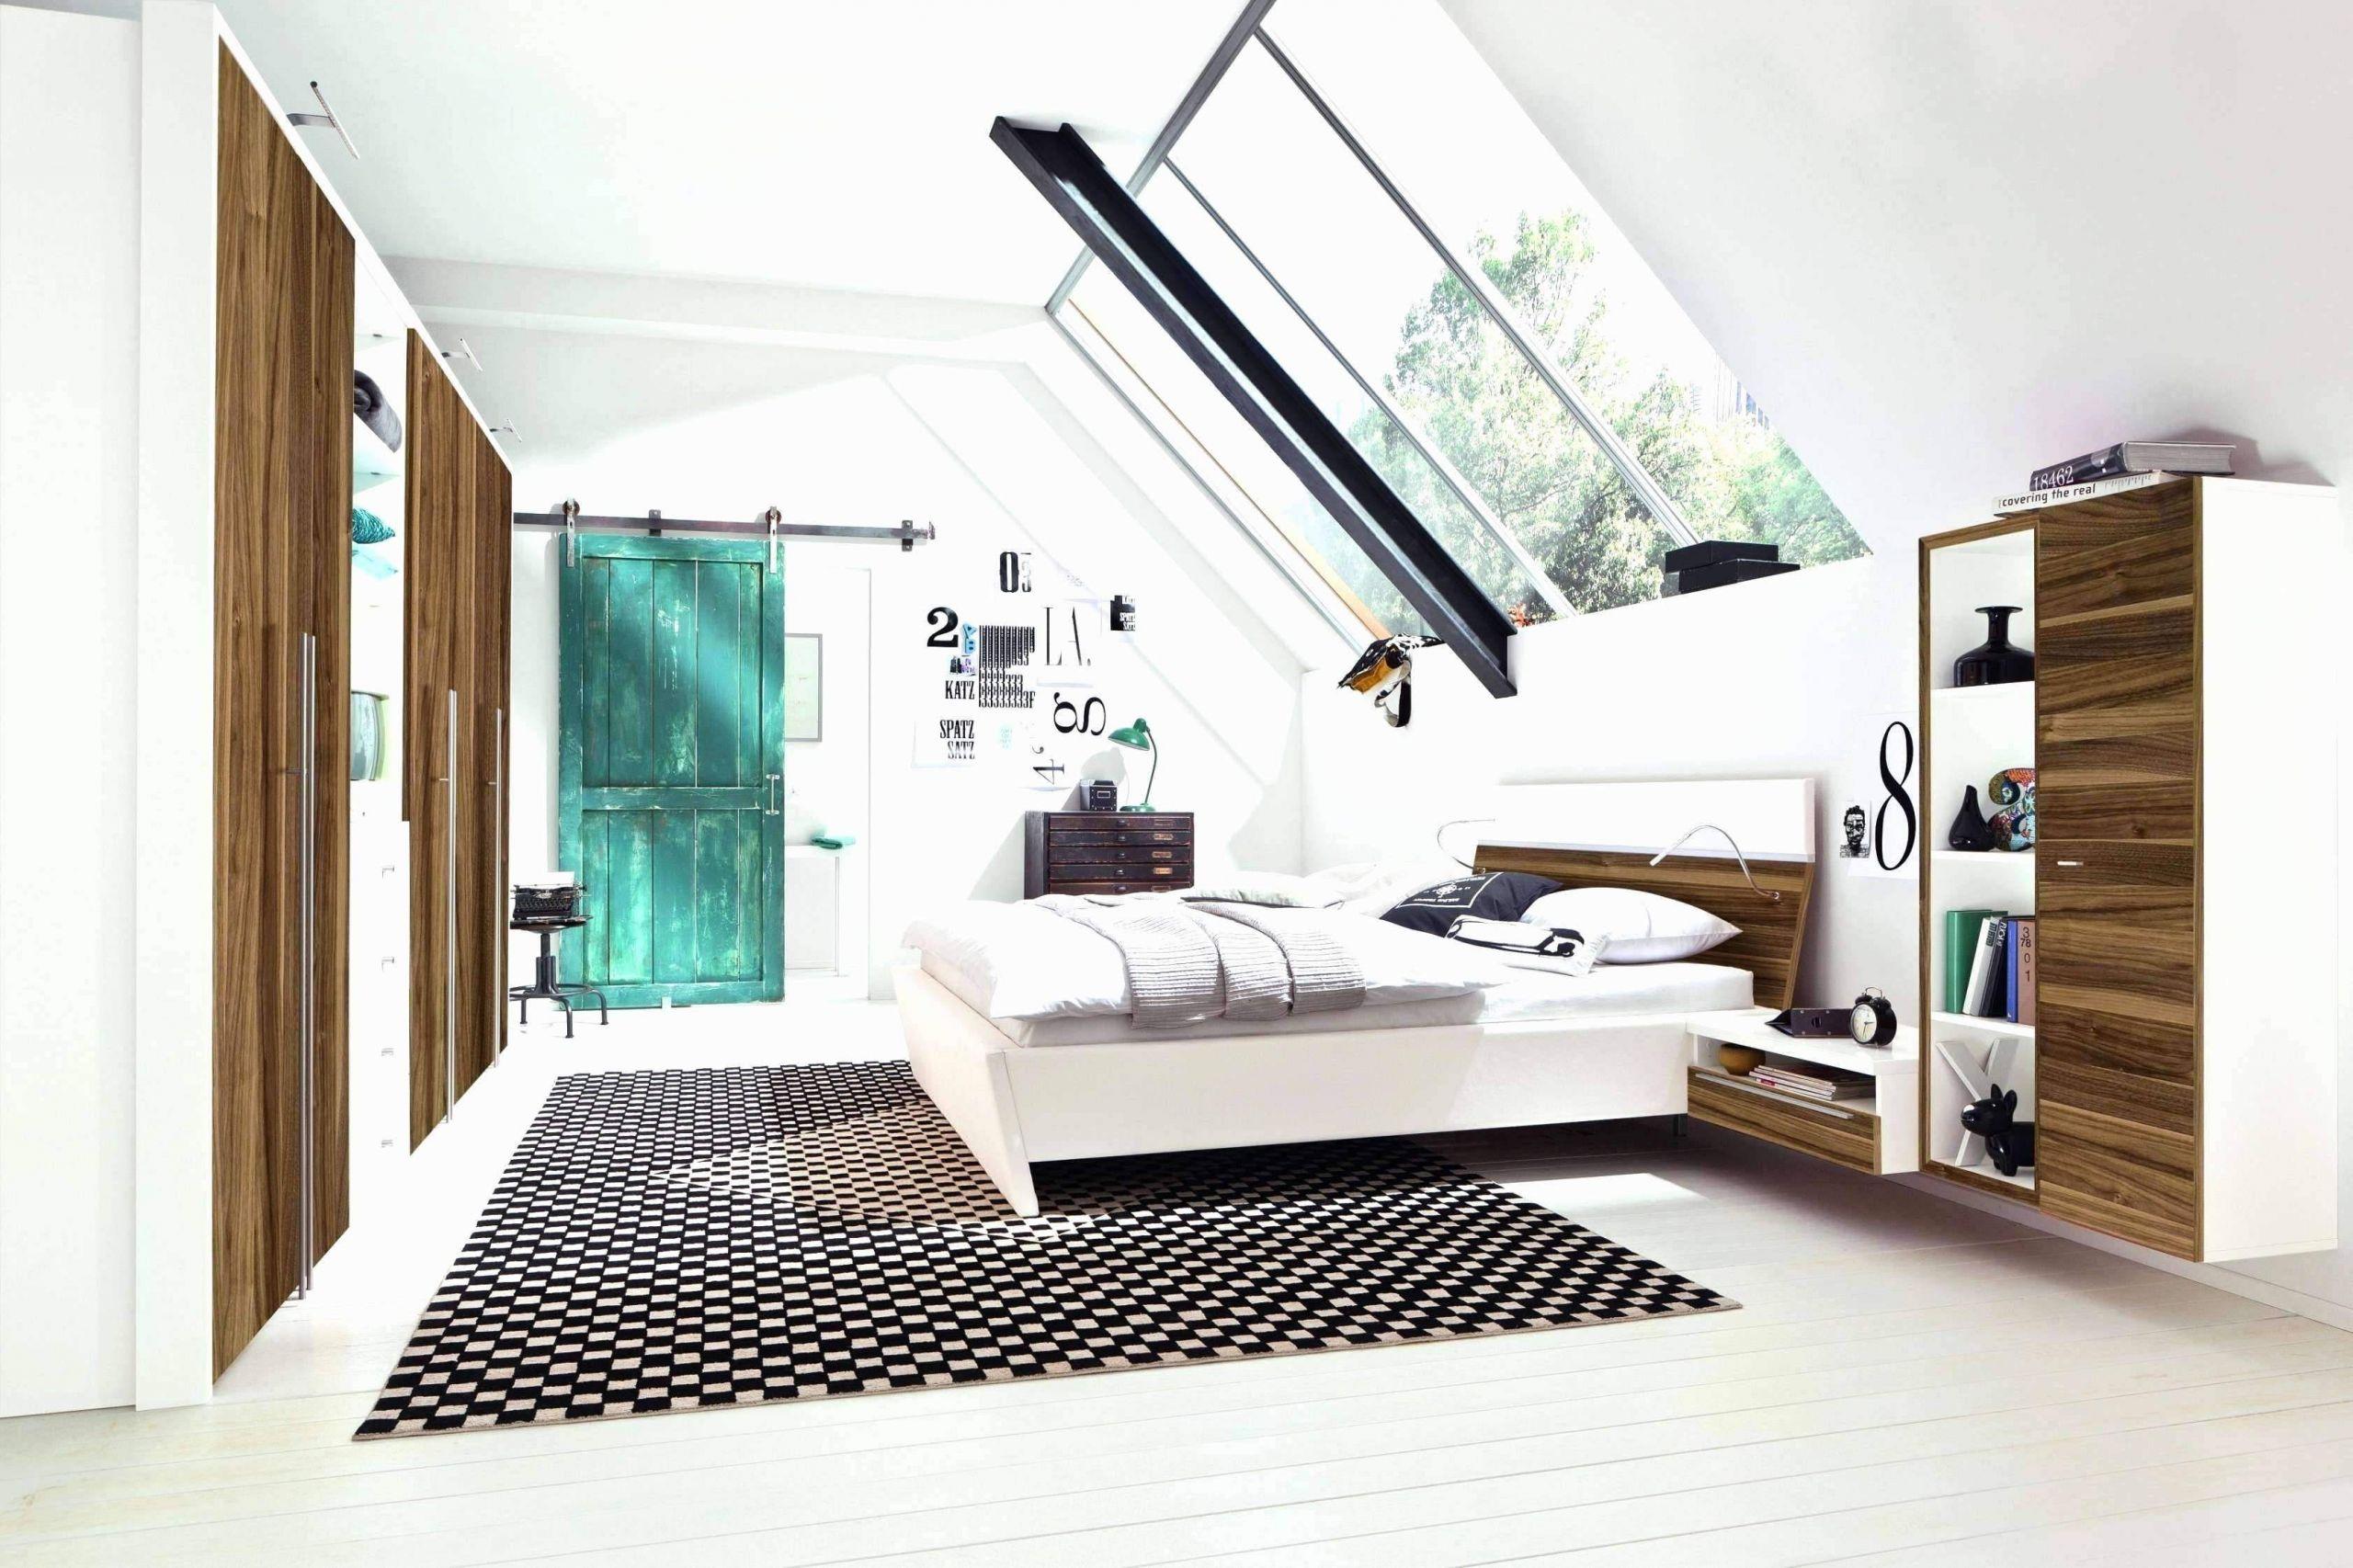 regal ideen wohnzimmer beautiful deko schlafzimmer regal ideen wohnzimmer schon regal schlafzimmer 0d of regal ideen wohnzimmer